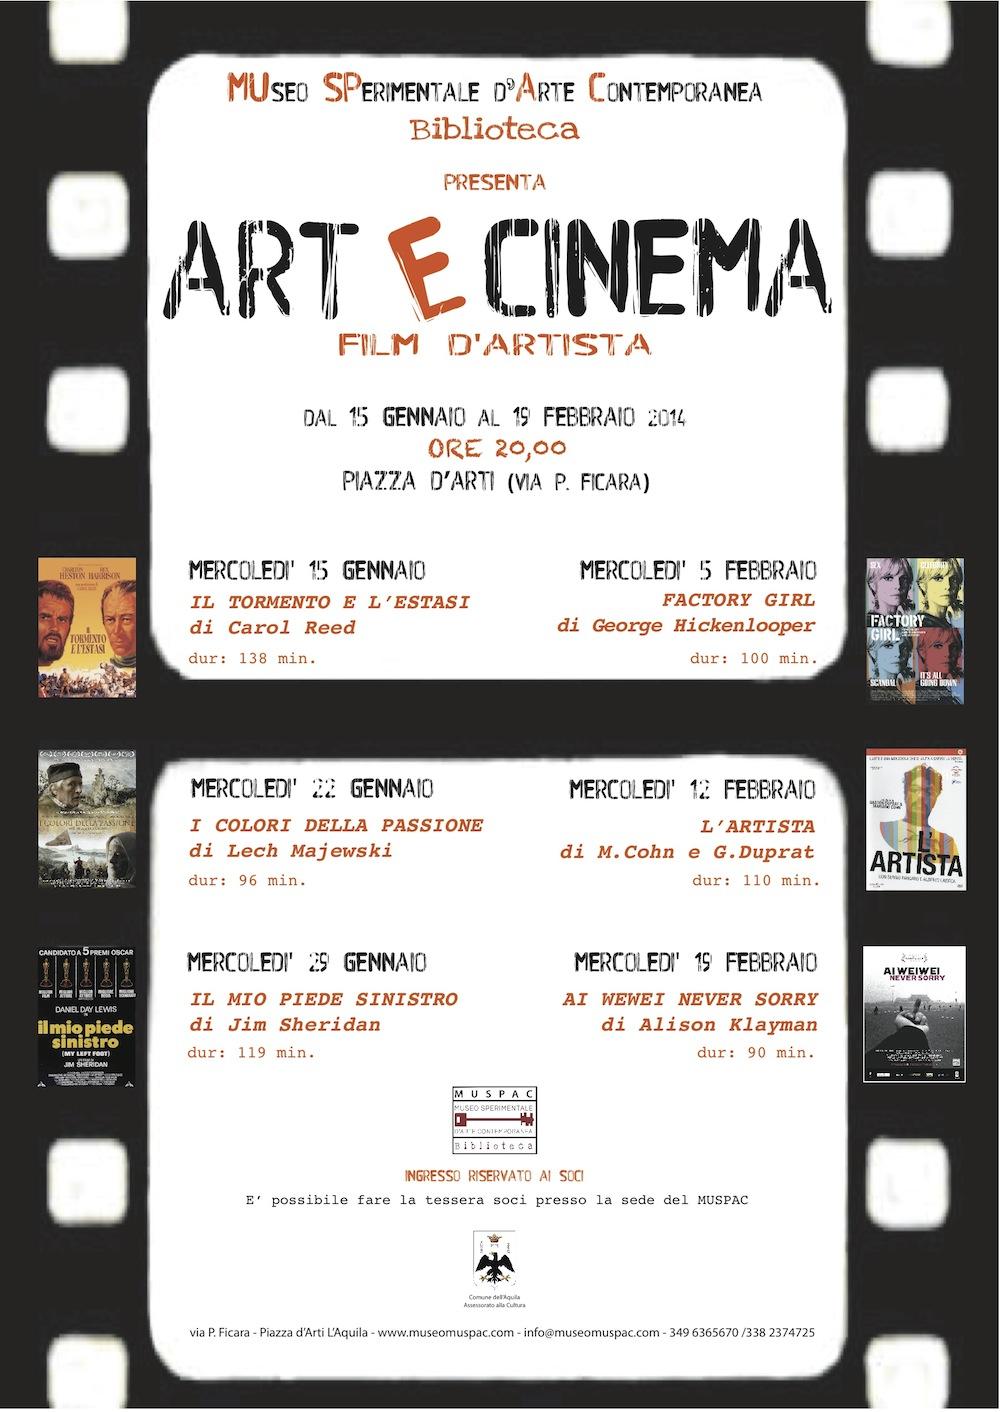 locandina ARTeCINEMA_FILM D'ARTISTA_gennaio-febbraio2014